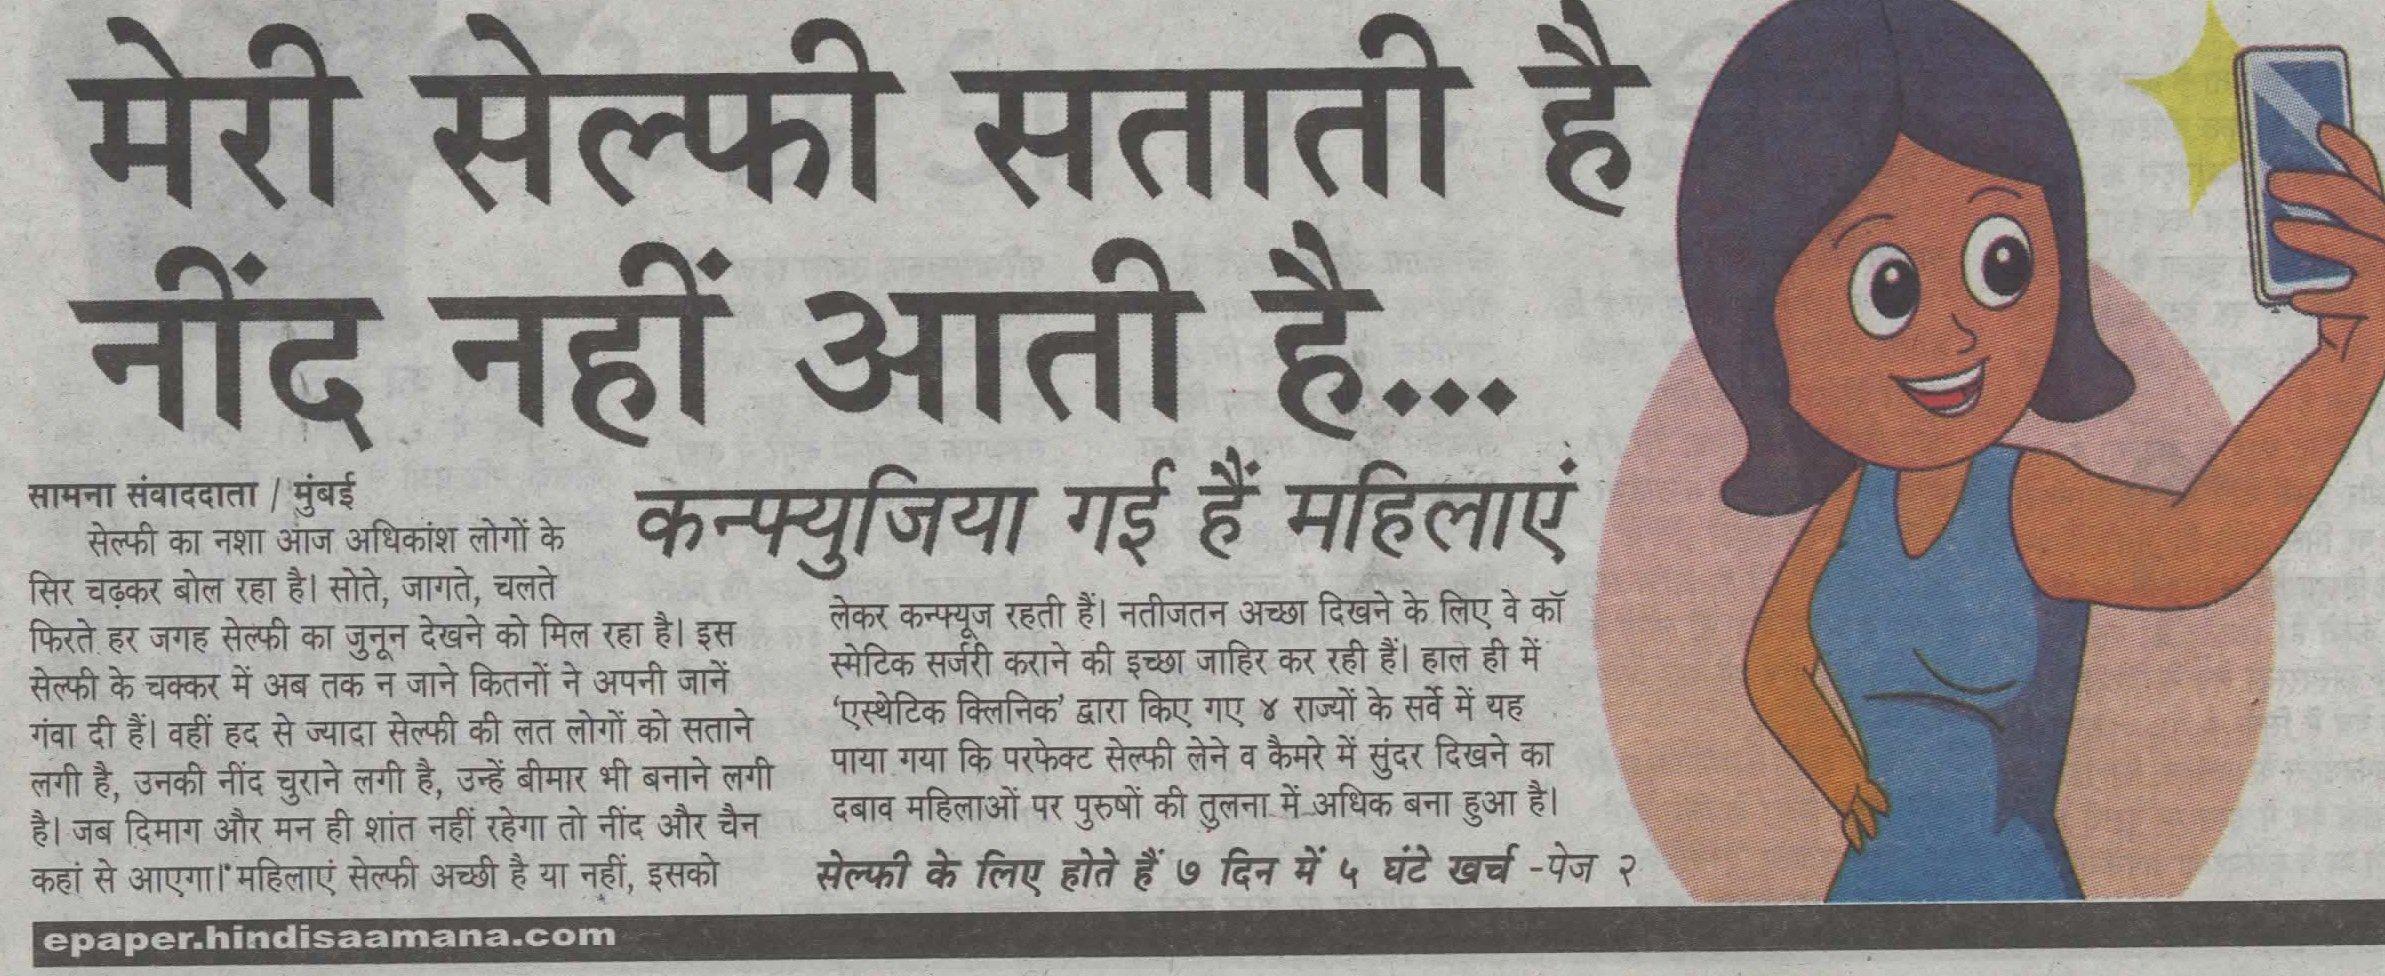 Selfie Dysmorphia increase in India - Dopahar Ka Samana